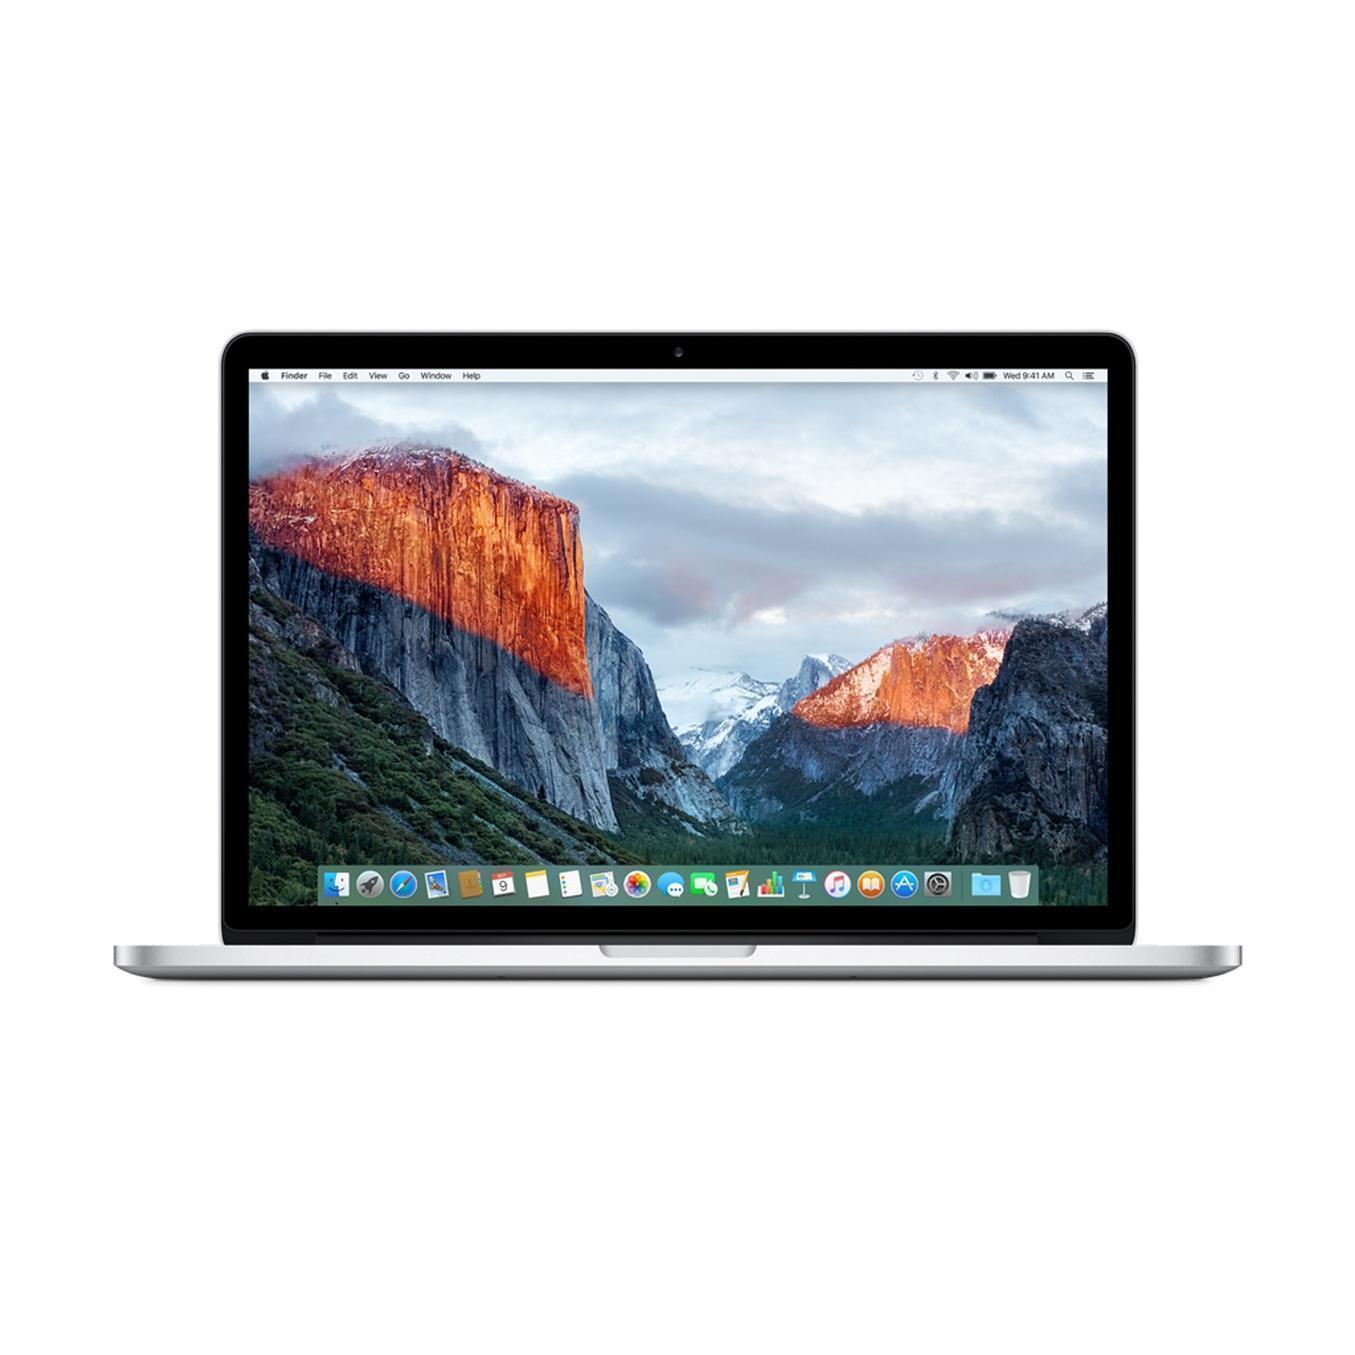 MacBook Pro Retina 15.4-inch (2014) - Core i7 - 16GB - SSD 500 GB